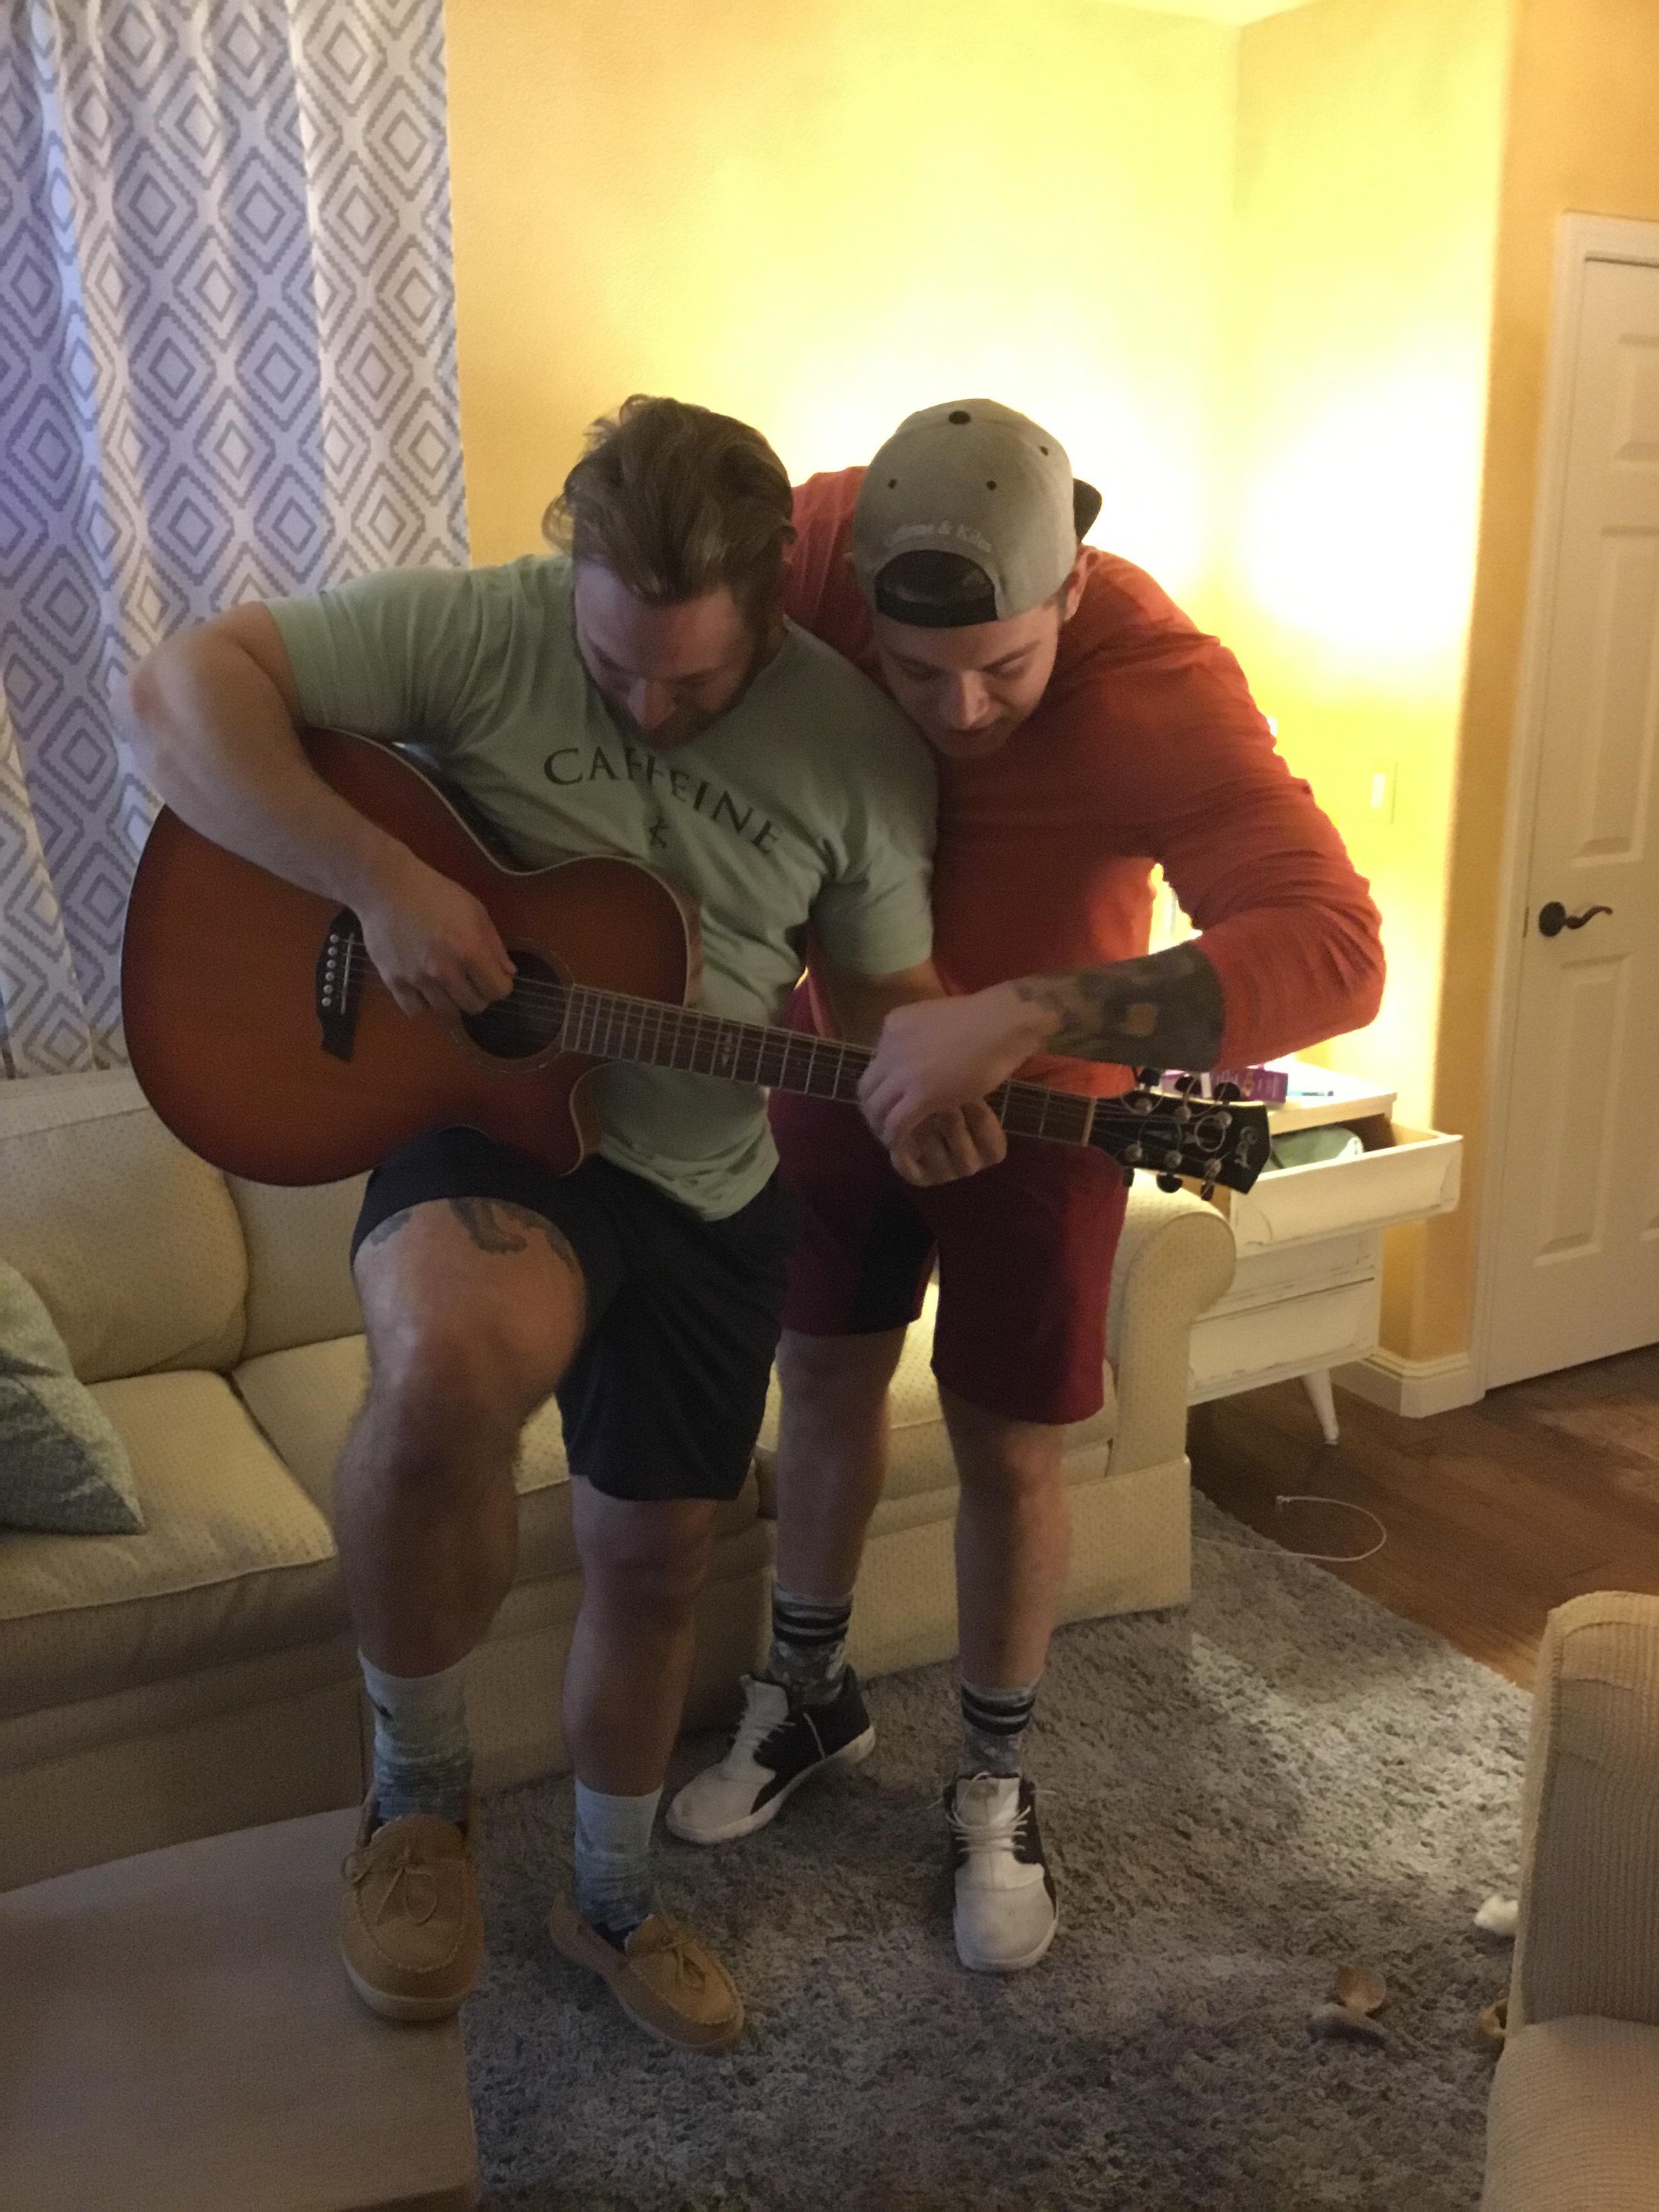 Guitar lessons! 🎸